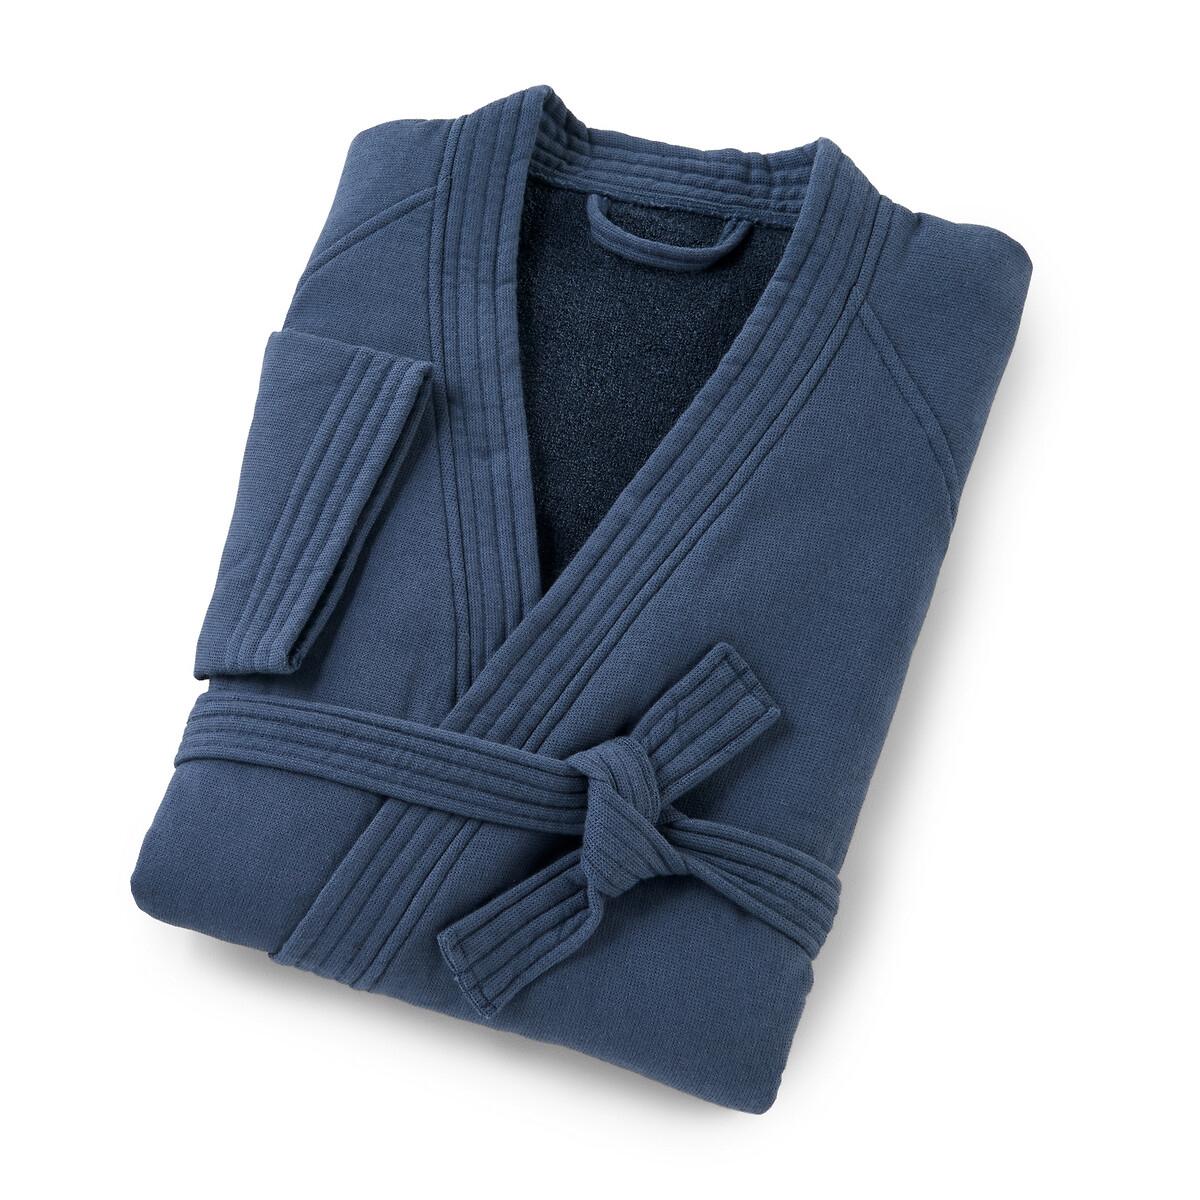 Пеньюар-кимоно LaRedoute — Из двух материалов Japanese 46/48 (FR) - 52/54 (RUS) синий